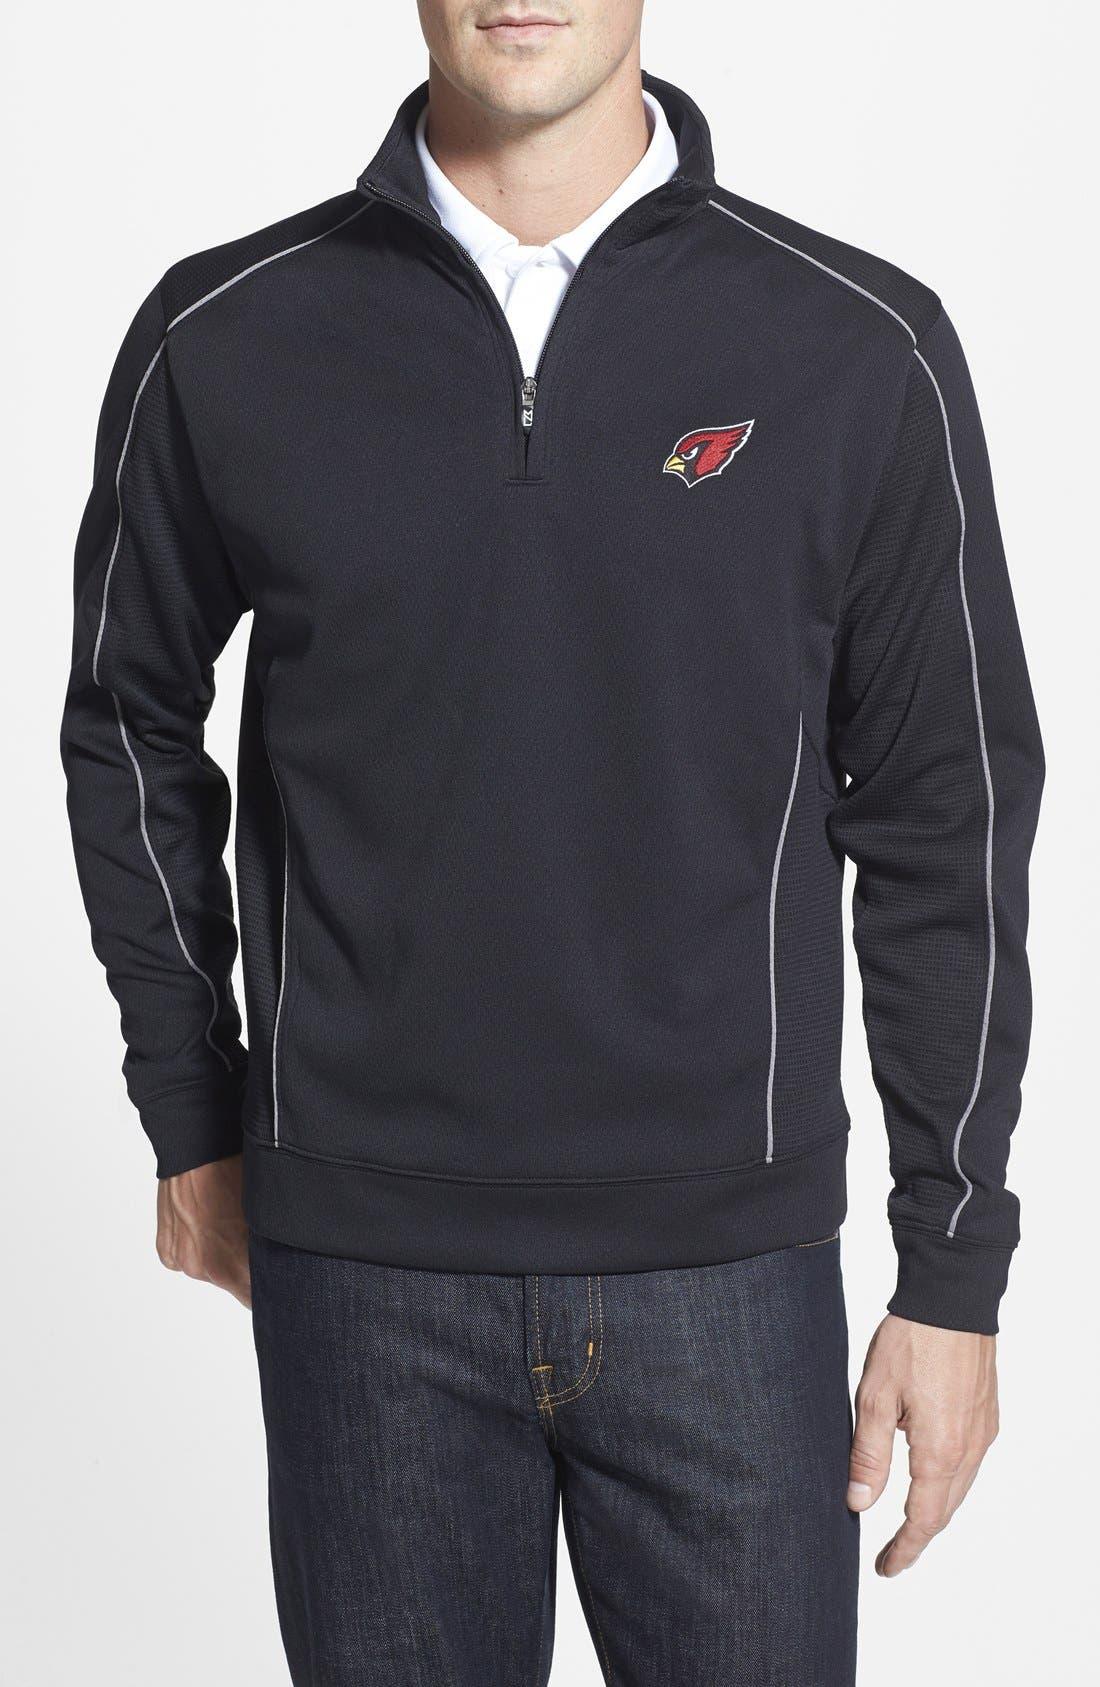 Main Image - Cutter & Buck Arizona Cardinals - Edge DryTec Moisture Wicking Half Zip Pullover